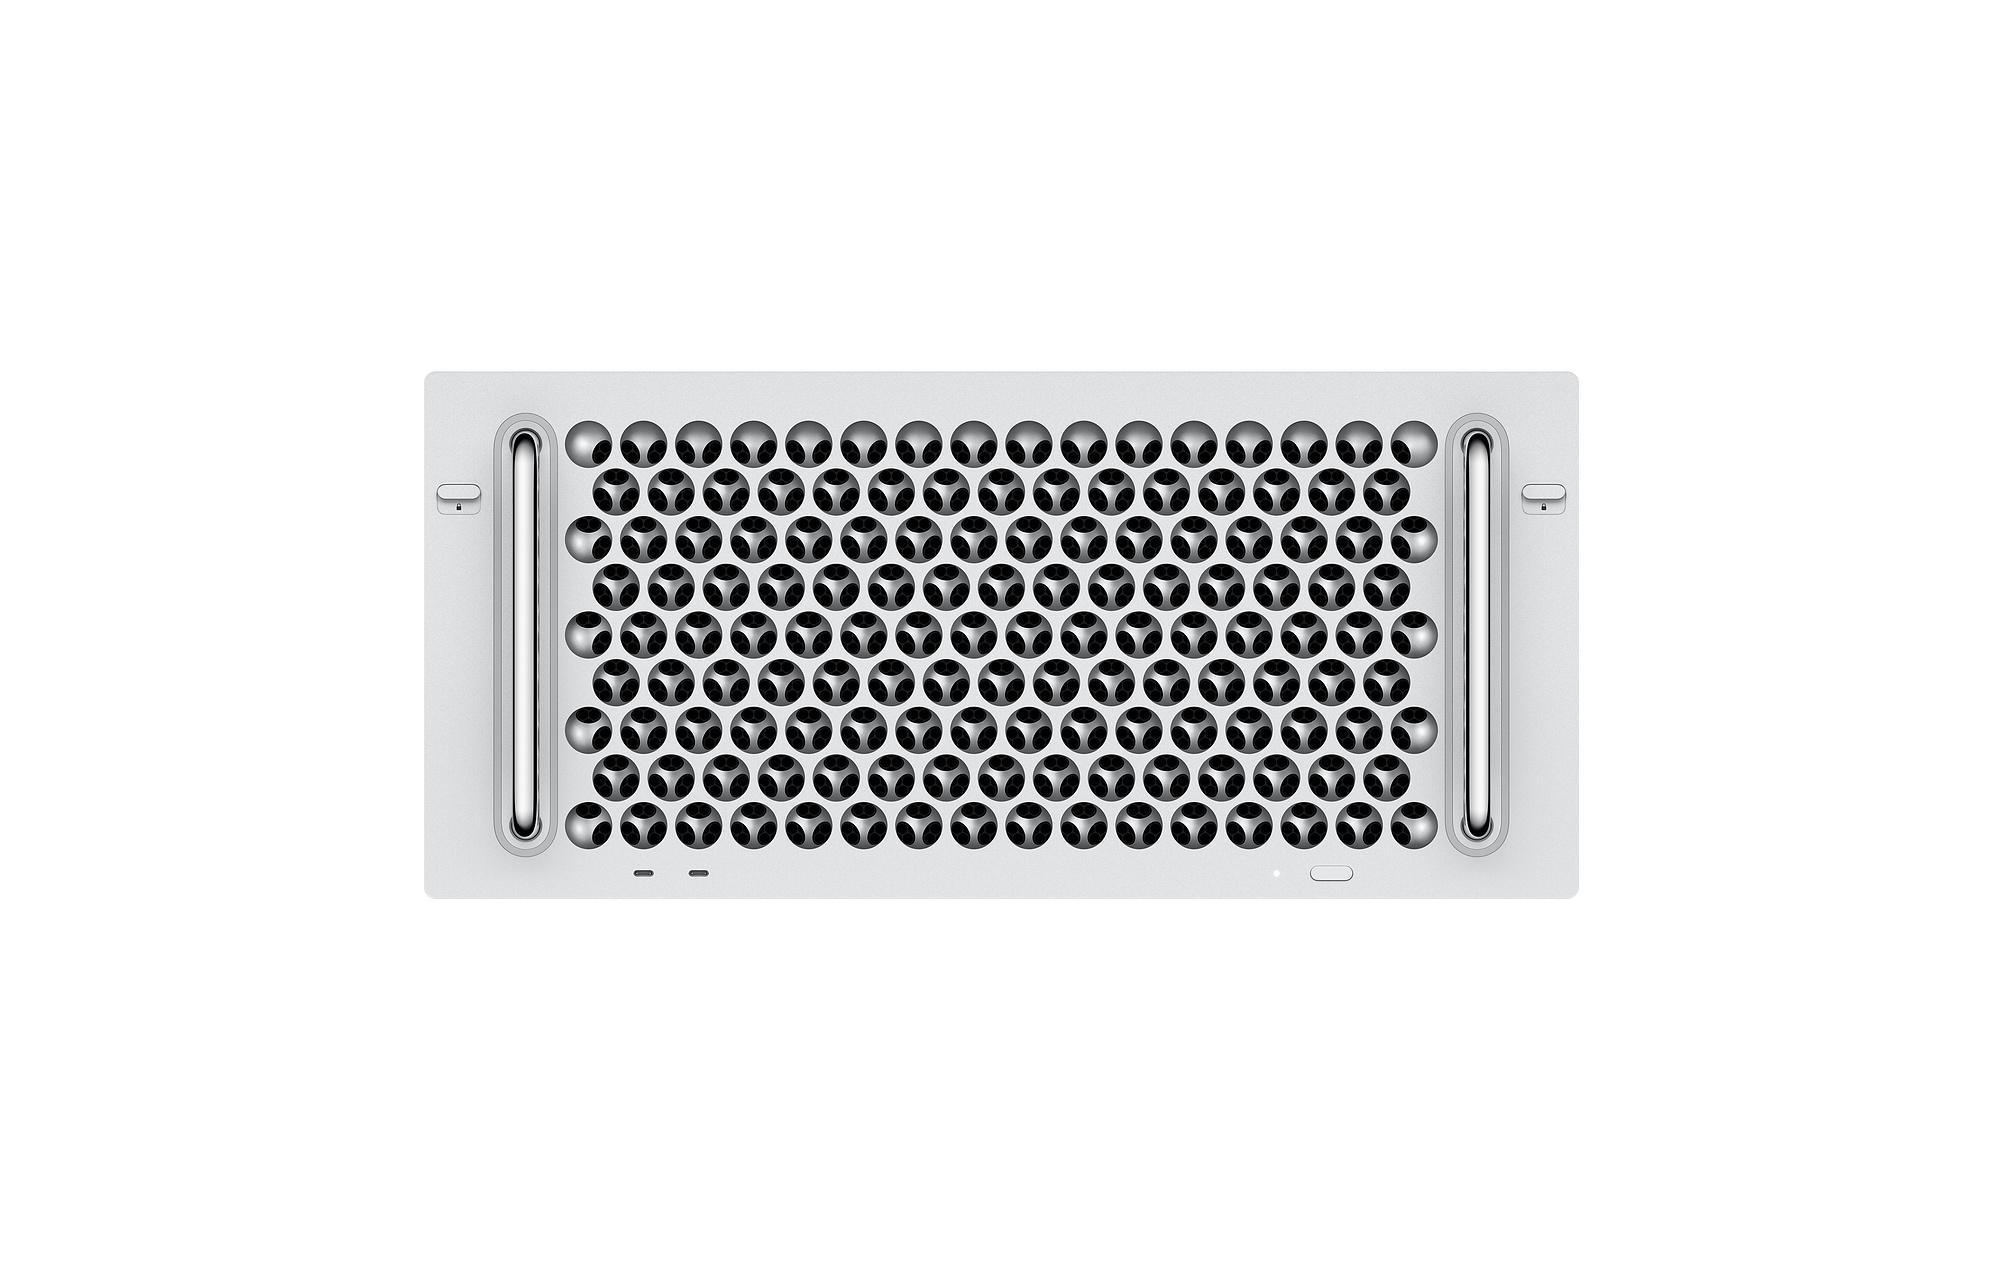 Mac Pro 2019 en format rack, vue de face